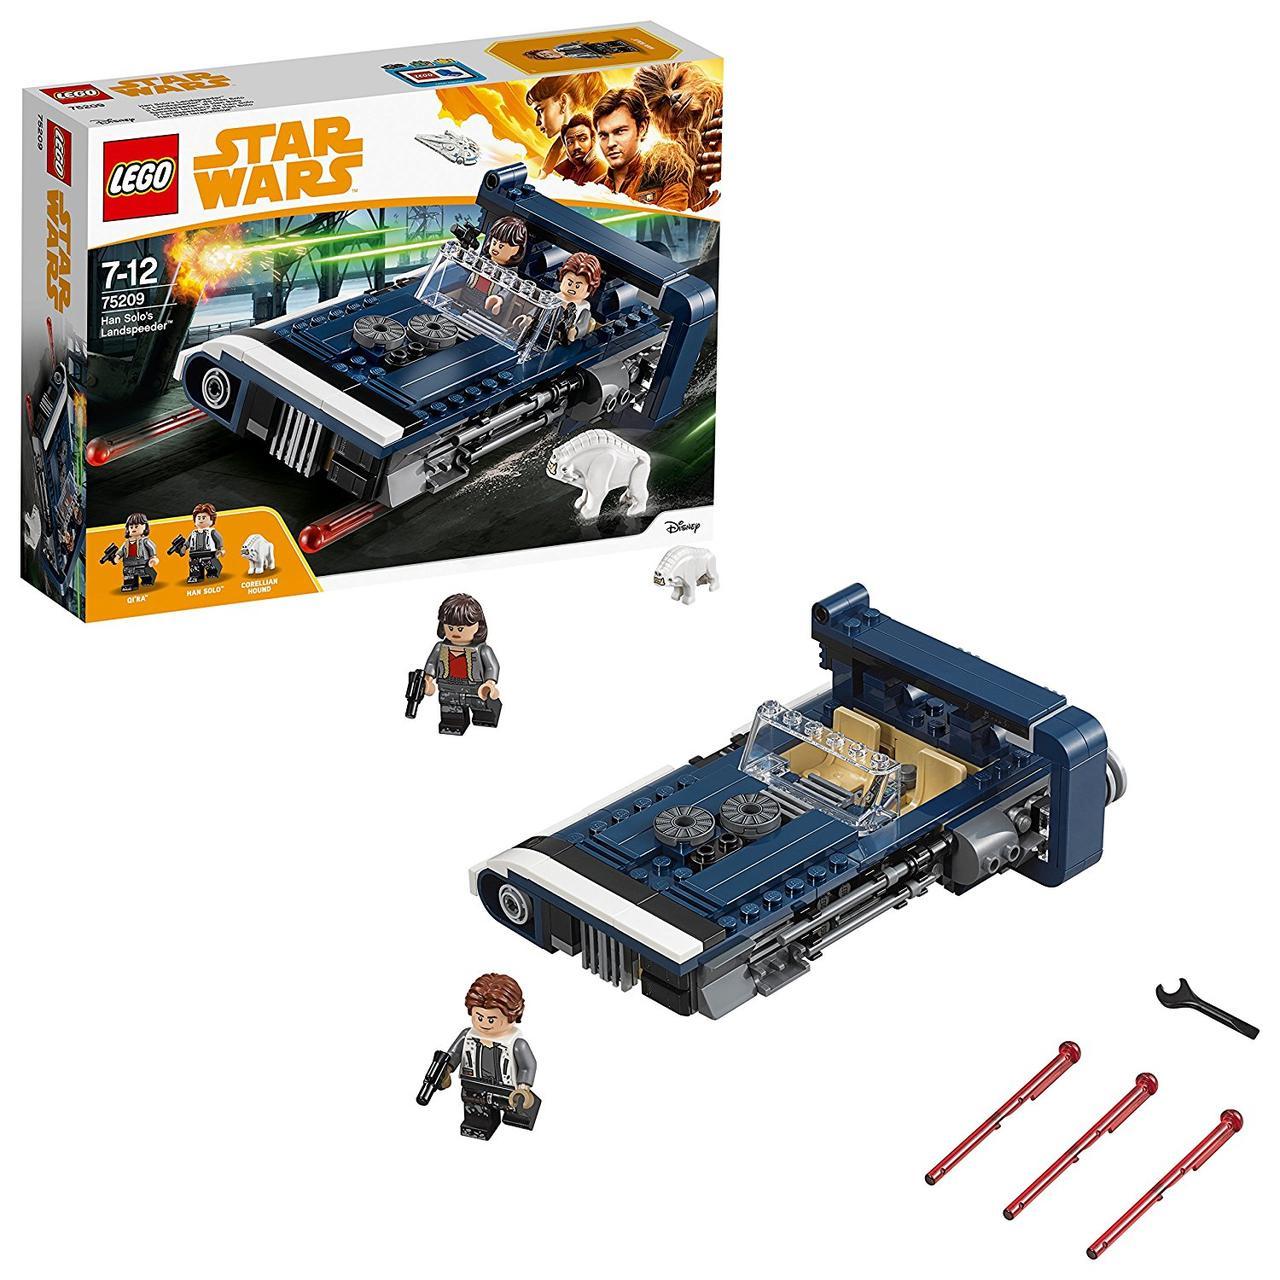 Lego Star wars 75209 Han Solo's Landspeeder. Спідер Хана Cоло (Конструктор Лего Старварс Спидер Хана Cоло)